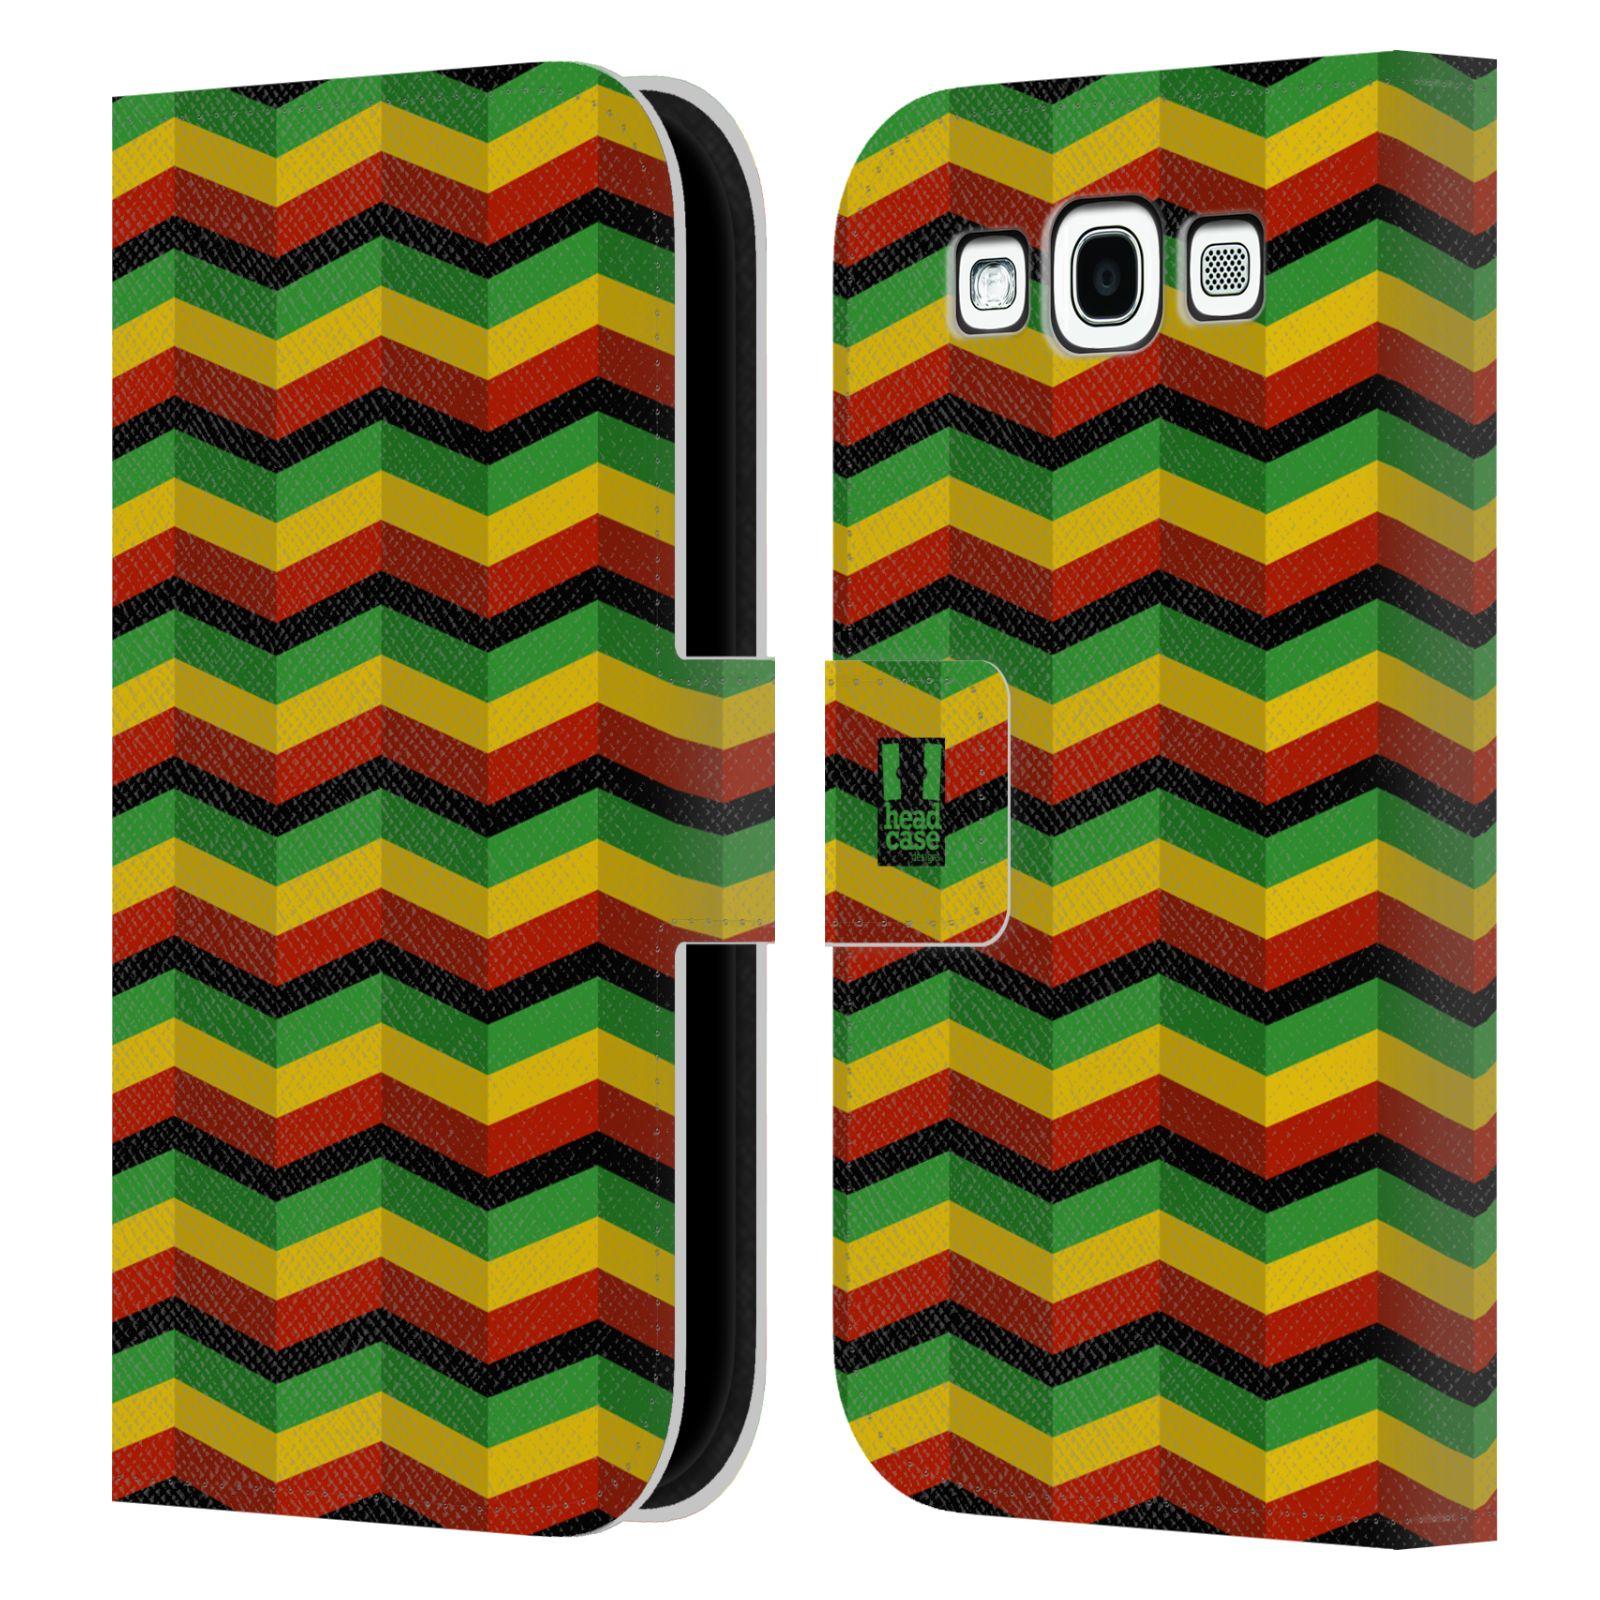 HEAD CASE Flipové pouzdro pro mobil Samsung Galaxy S3 Rastafariánský motiv Jamajka CHEVRON